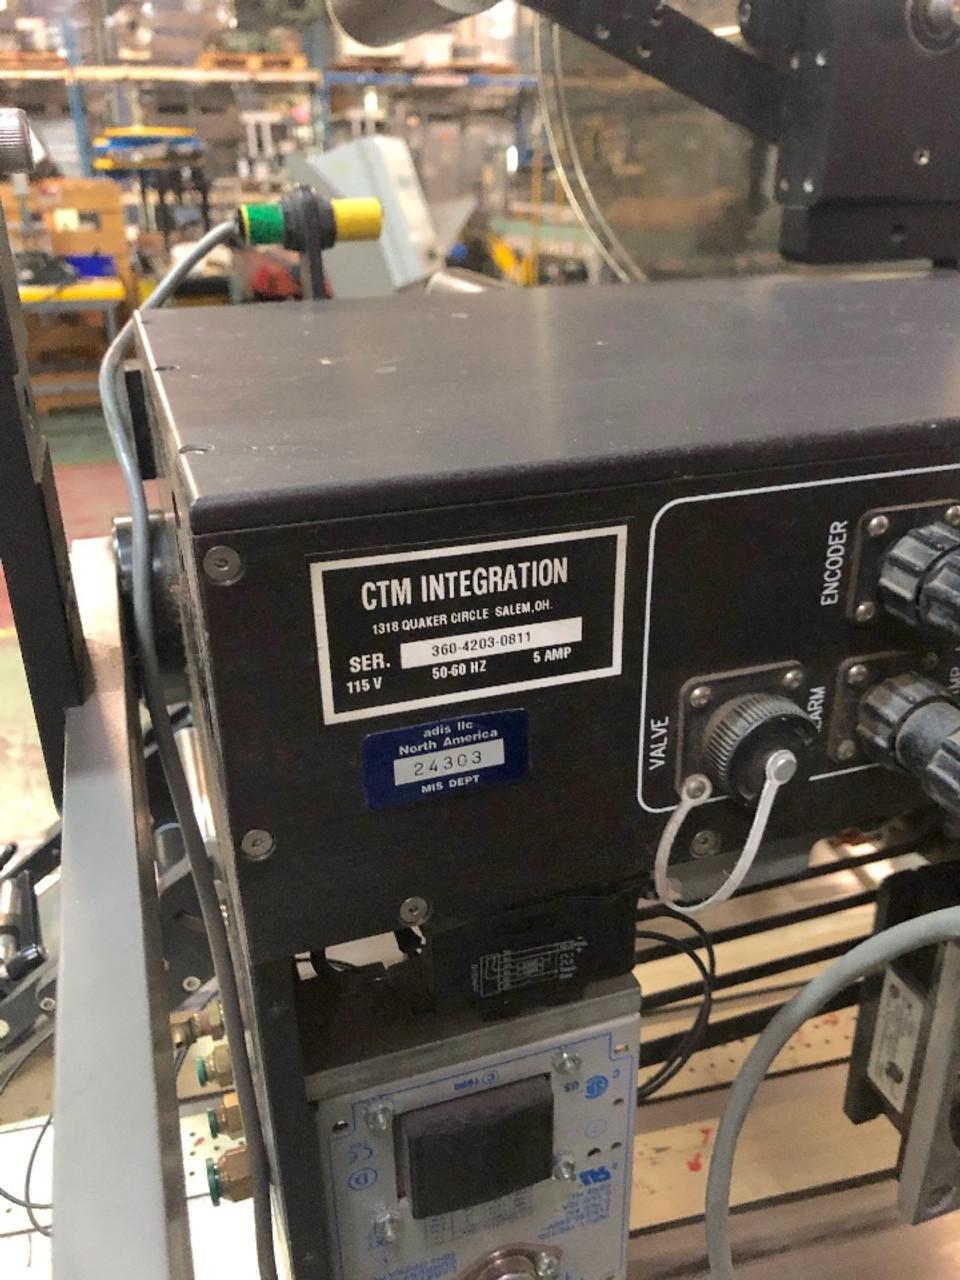 VideoJet Cheshire 7000 Friction Feeder Vacuum Table CTM 360 Label Applicator